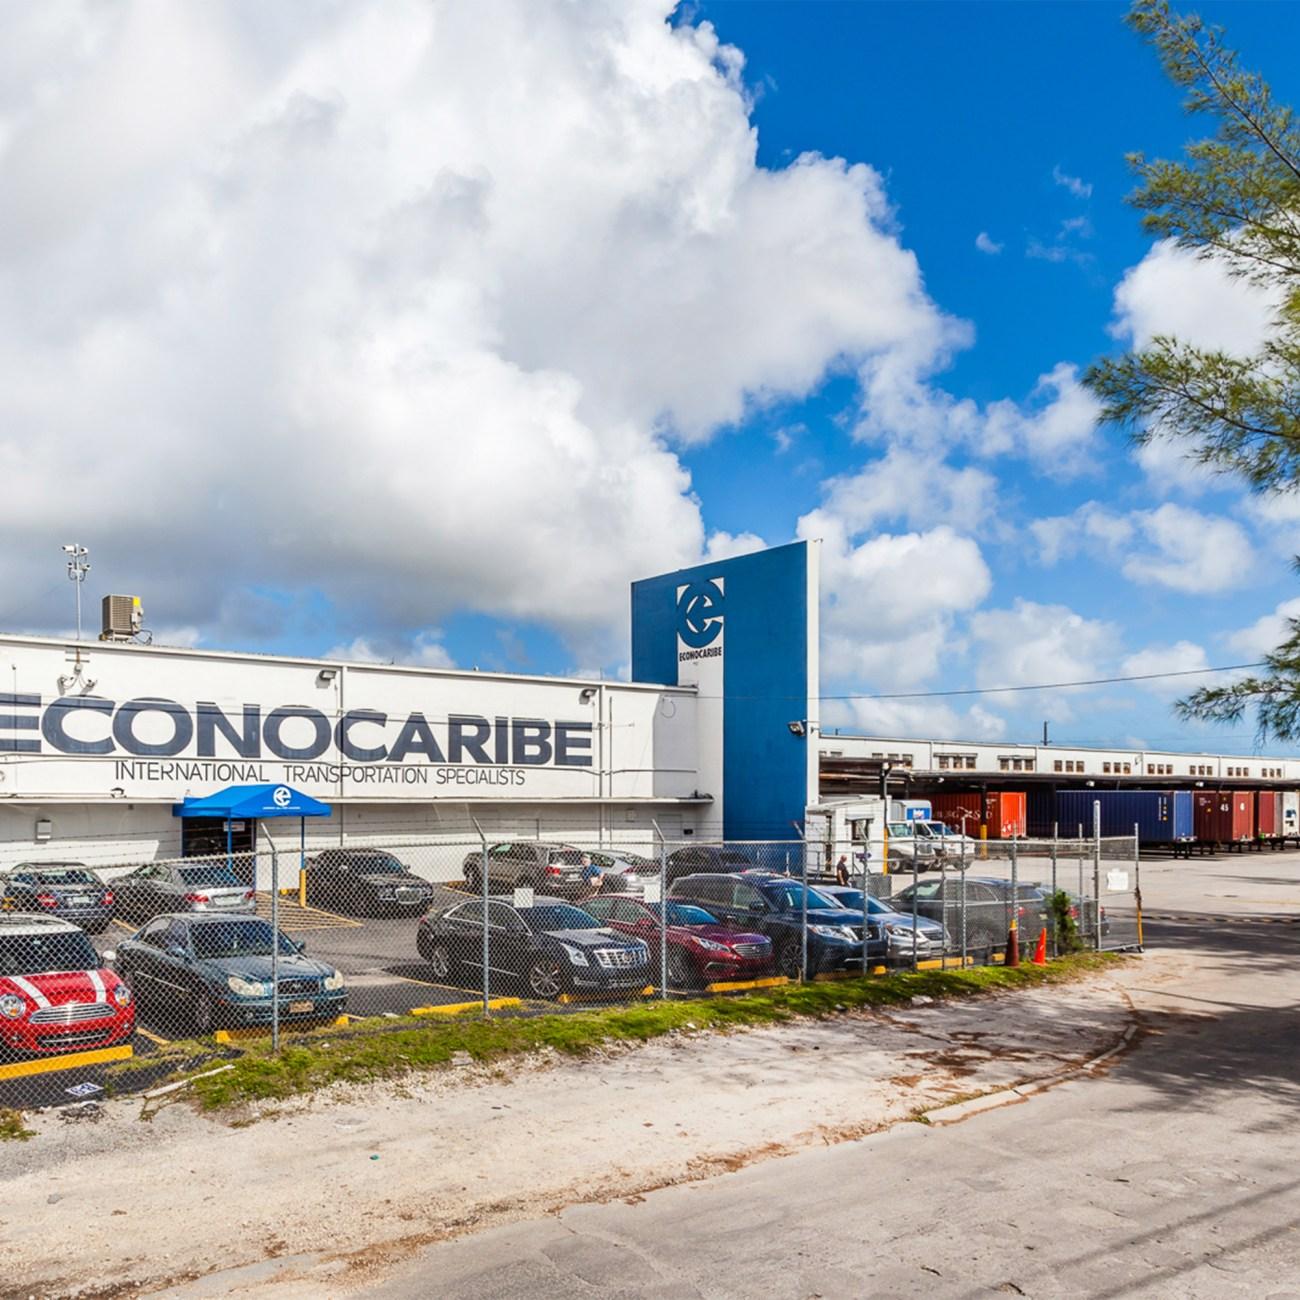 Trio of Brokers Negotiate Complex Sale of Miami's Econocaribe Building